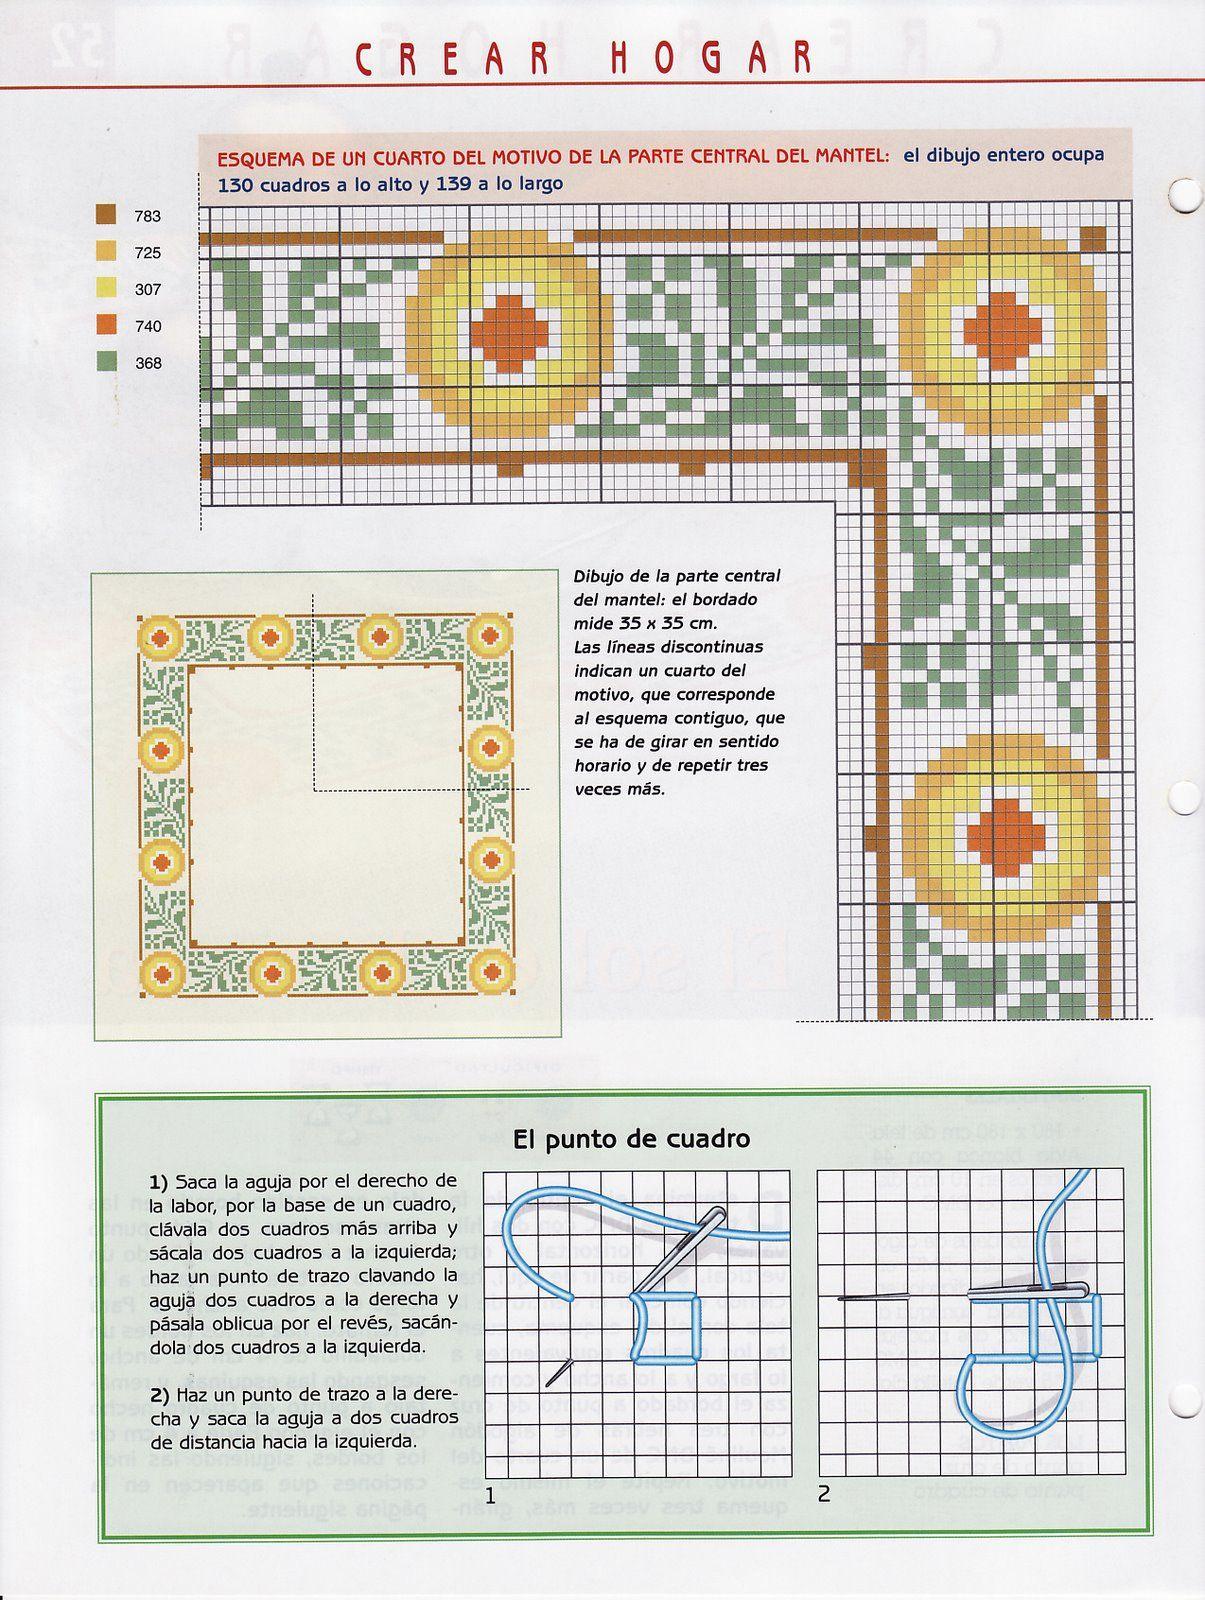 PuntoCruz.RBA.20_0003 — Postimage.org